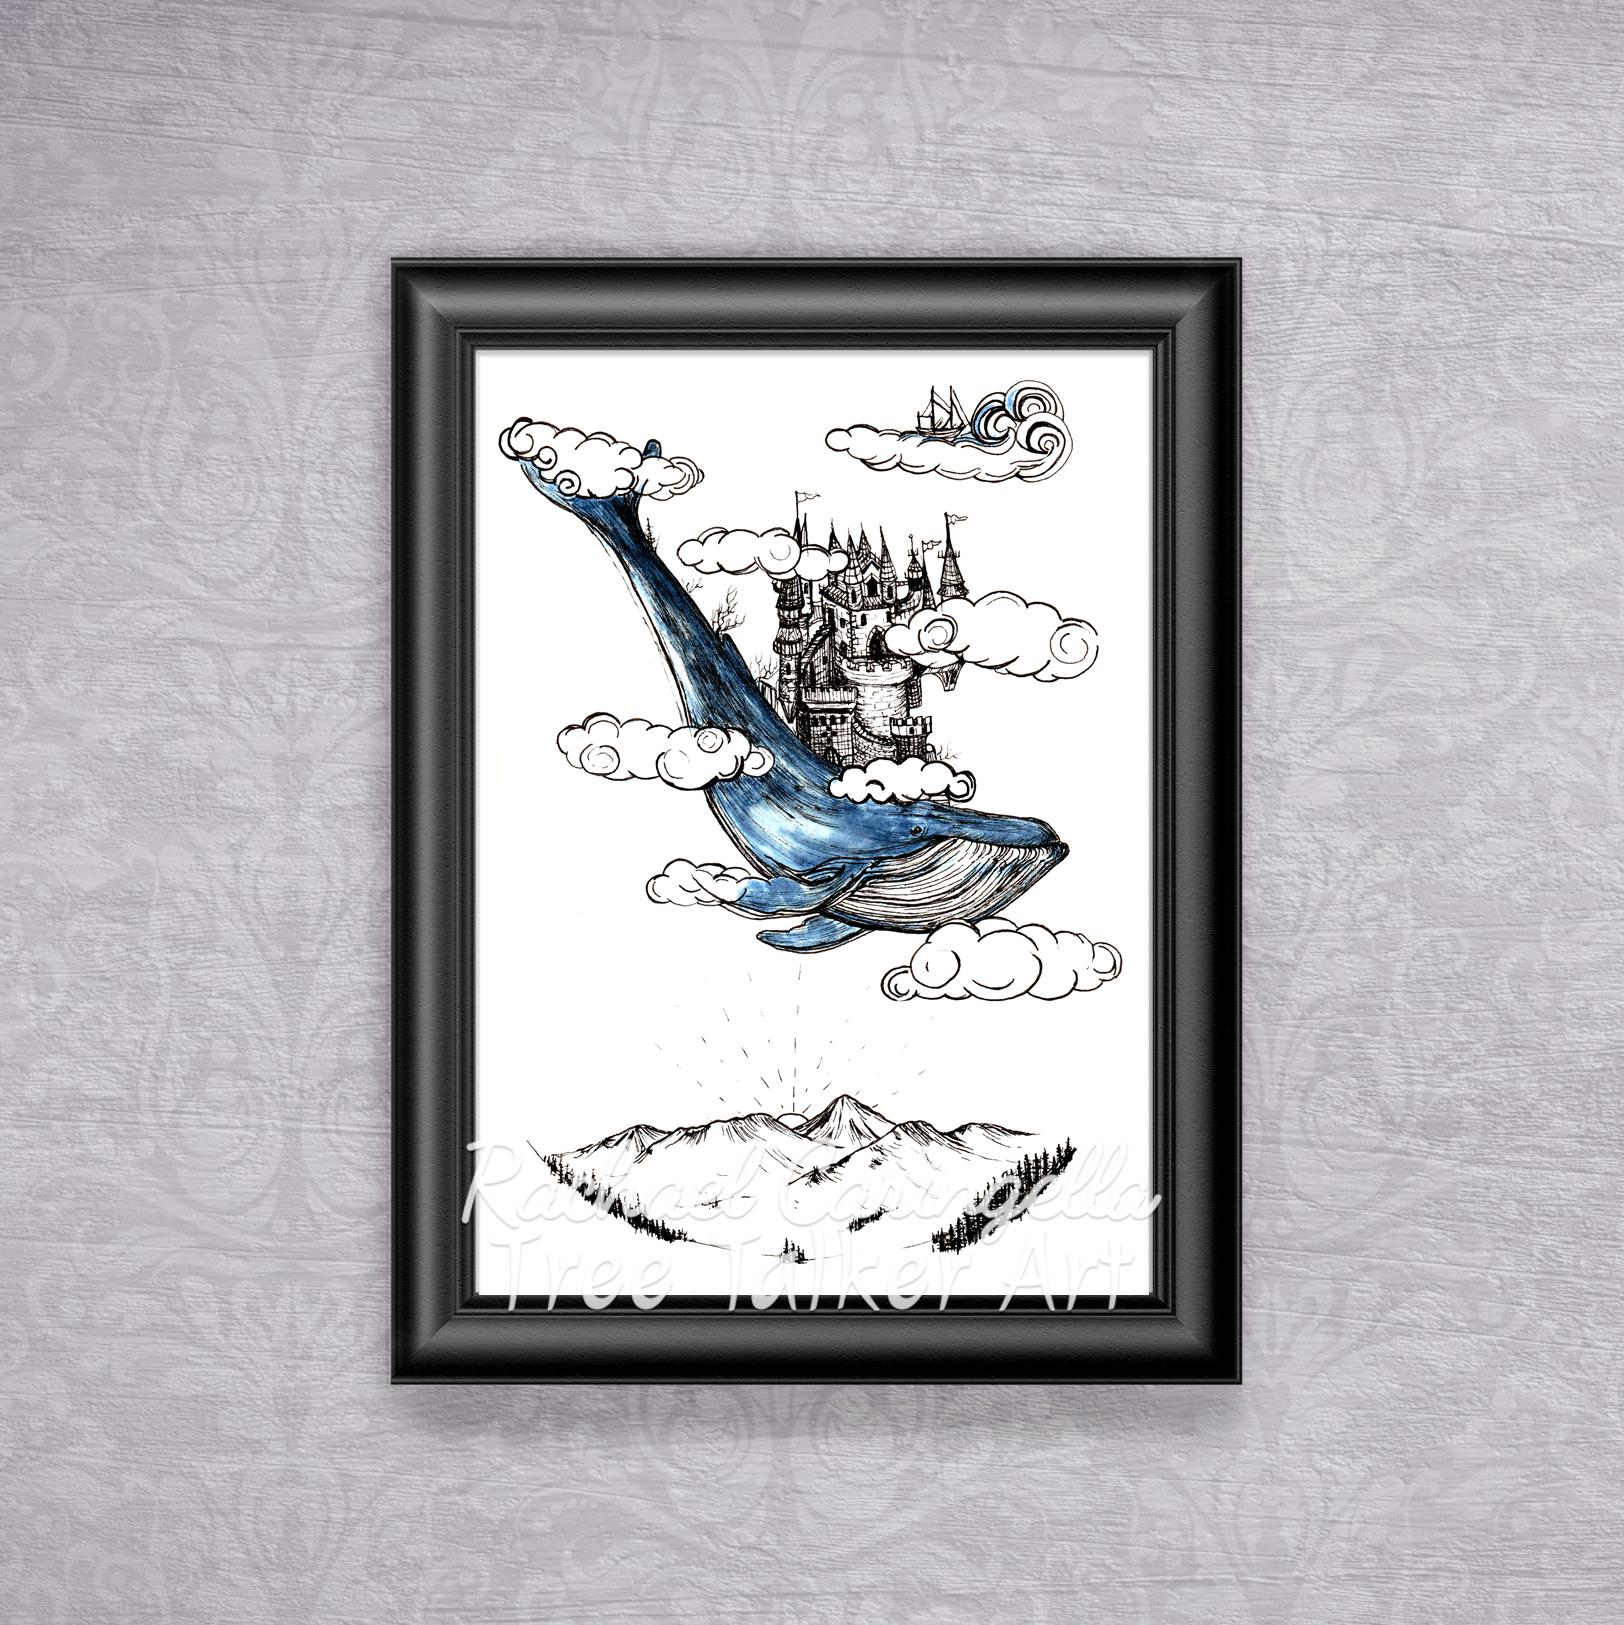 Castle on a whale Tree Talker Art Inktober 2018 Illustration of a Castle on a whale fantasy